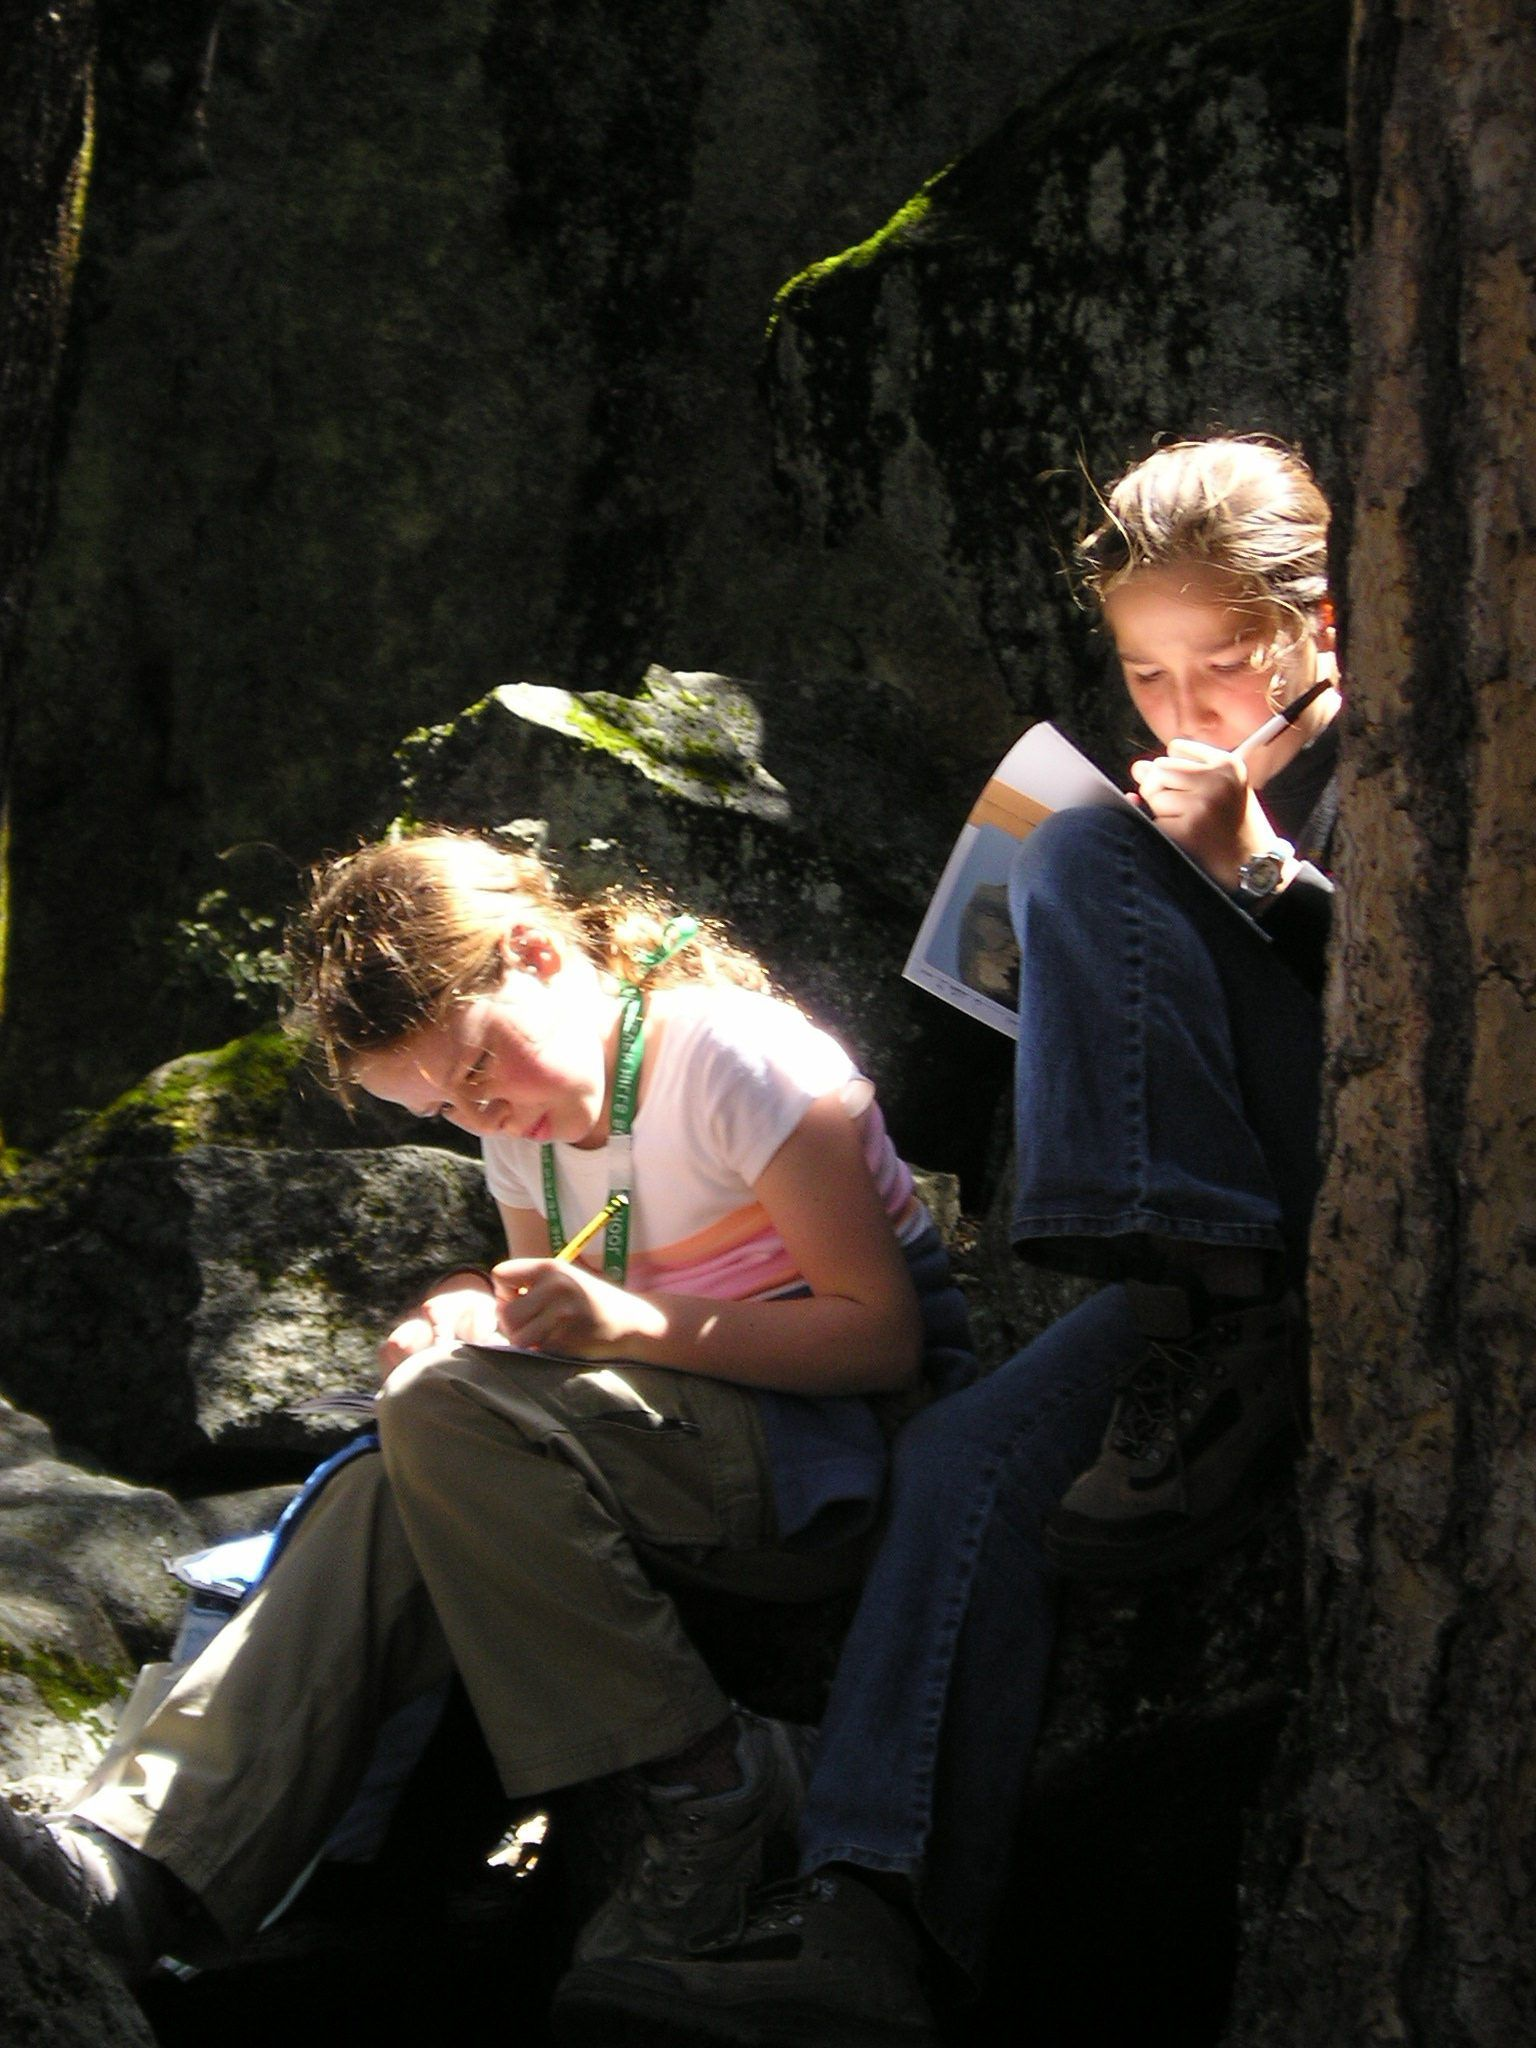 re you a school teacher who would like to lead nature journal re you a school teacher who would like to lead nature journal activities in your classroom